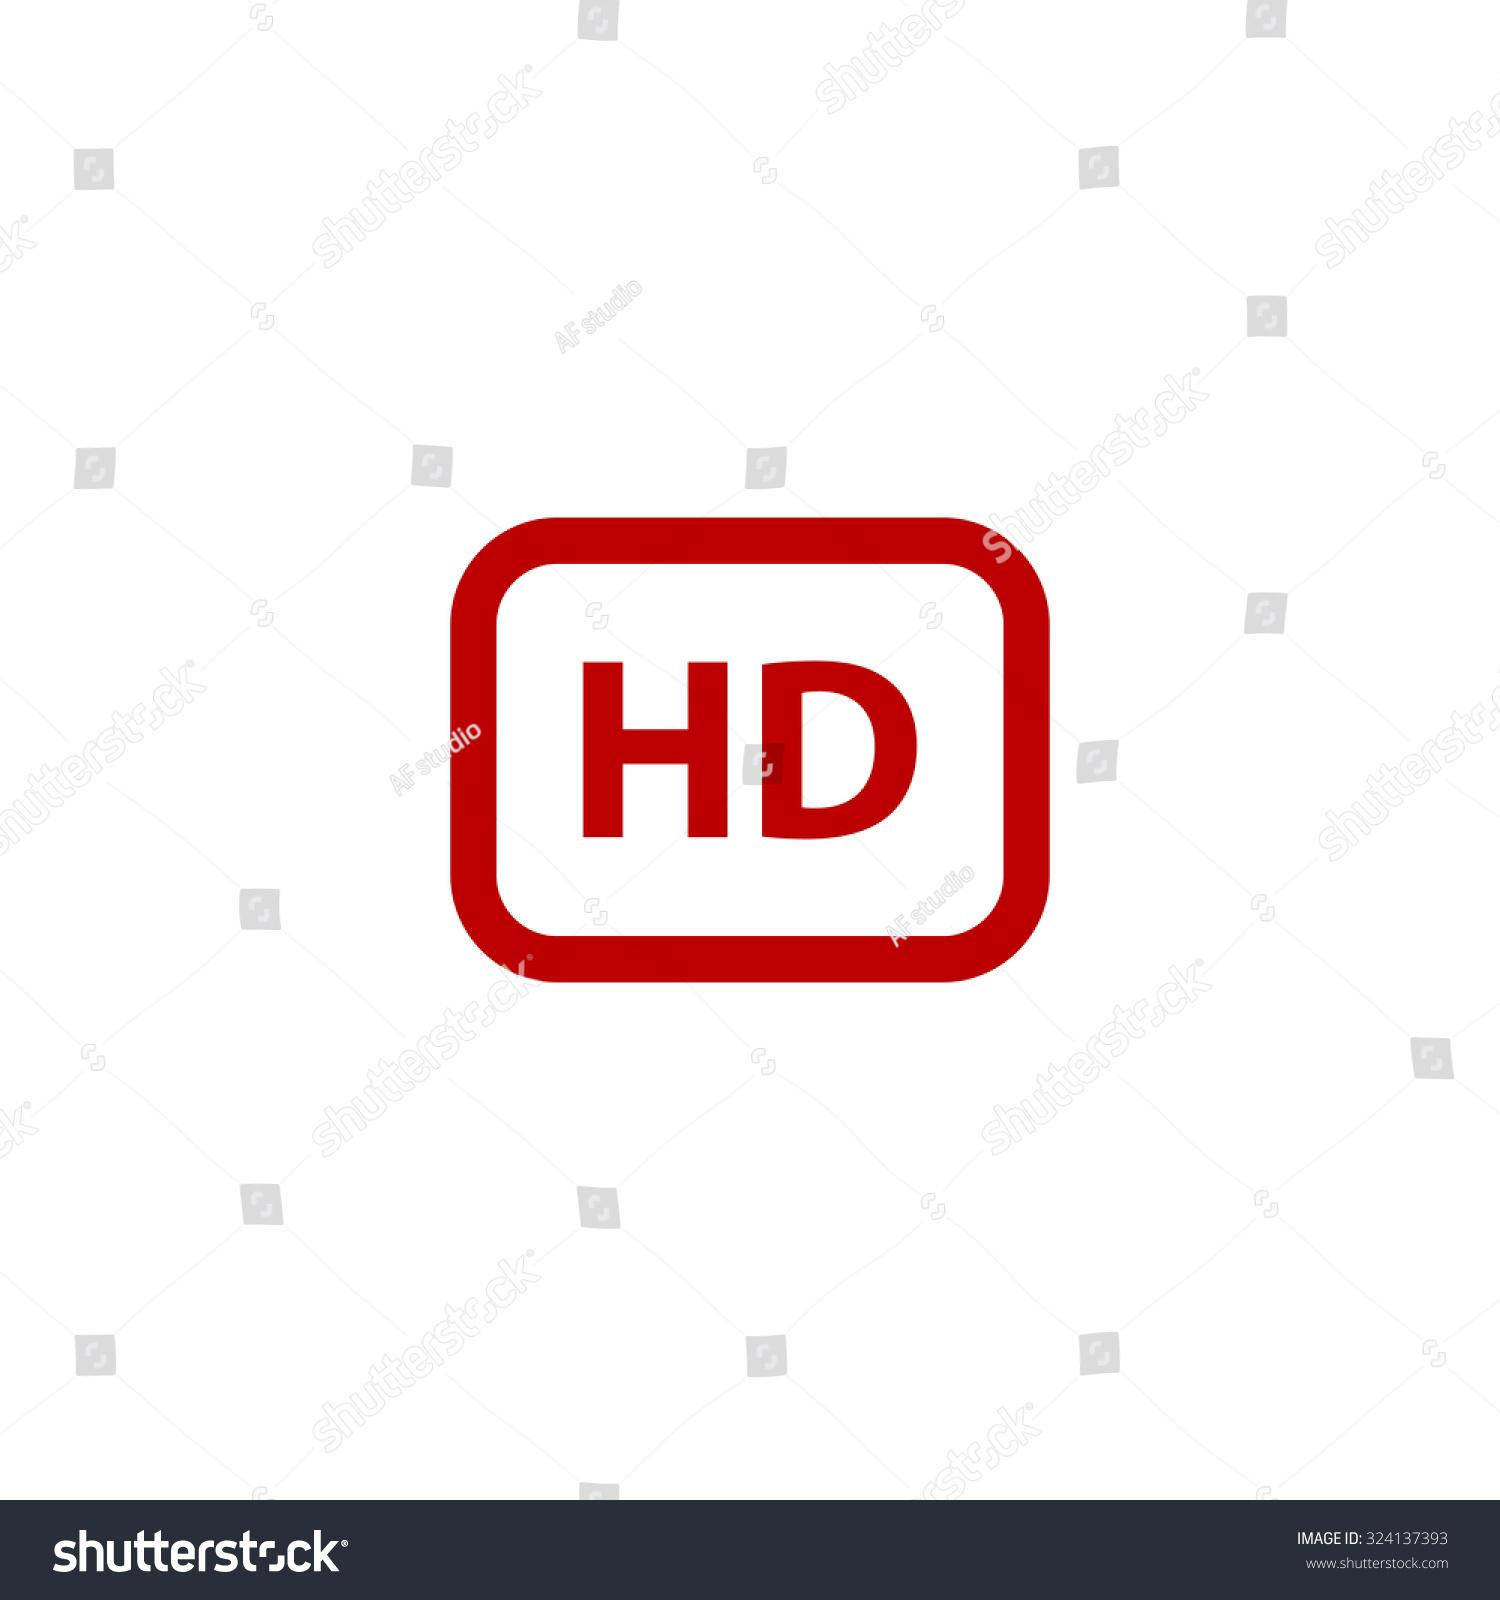 Hd word button red flat icon stock illustration 324137393 hd word button red flat icon illustration symbol on white background buycottarizona